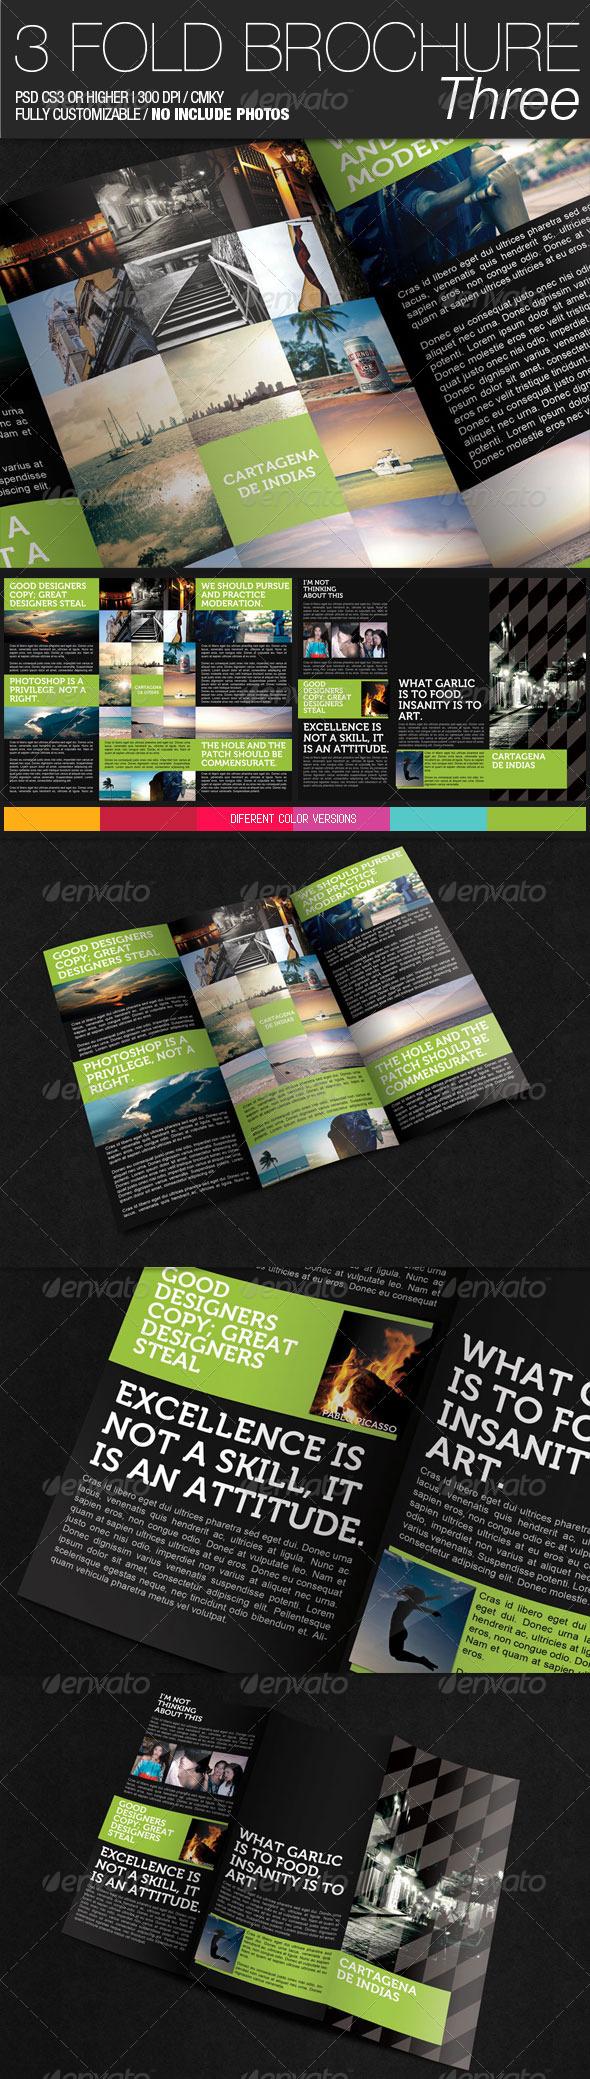 3 Fold Brochure III - Corporate Brochures